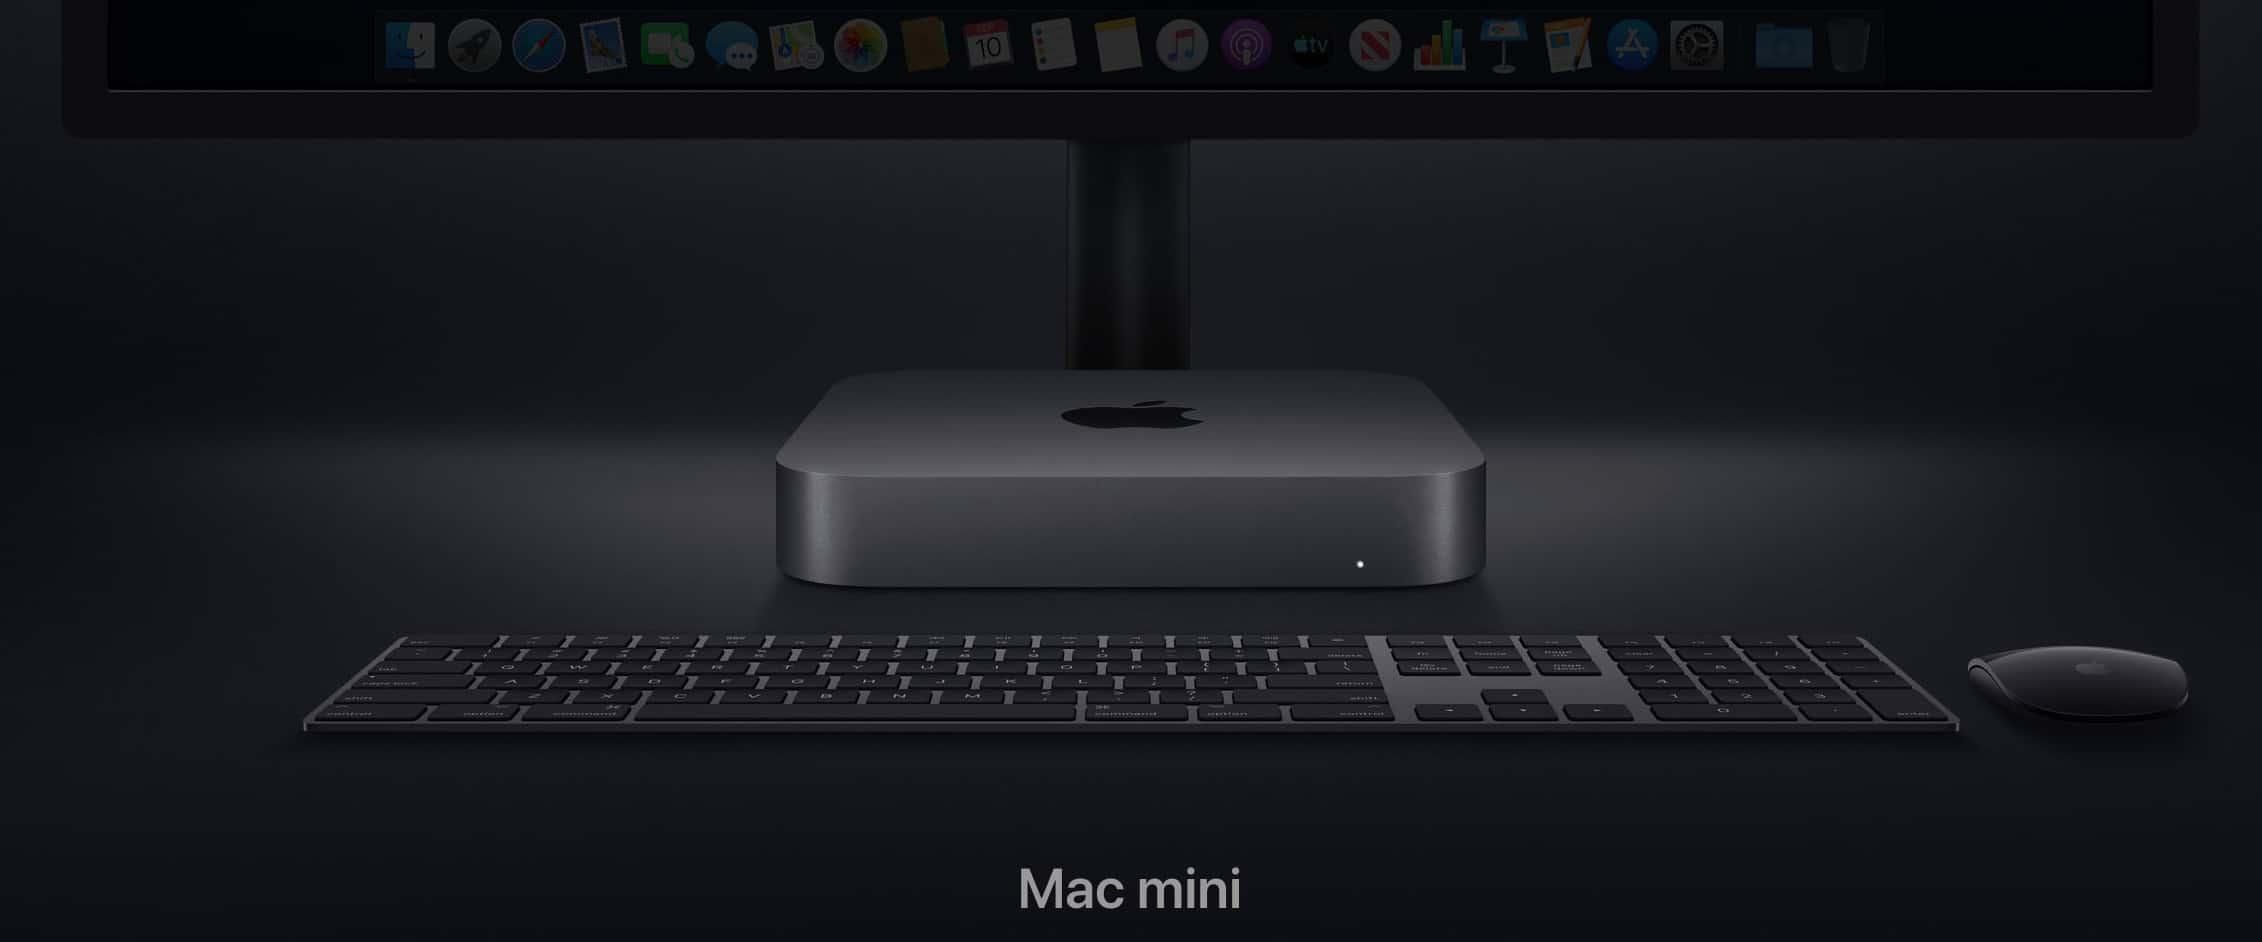 danh-gia-mac-mini-2020-laptopvang.com